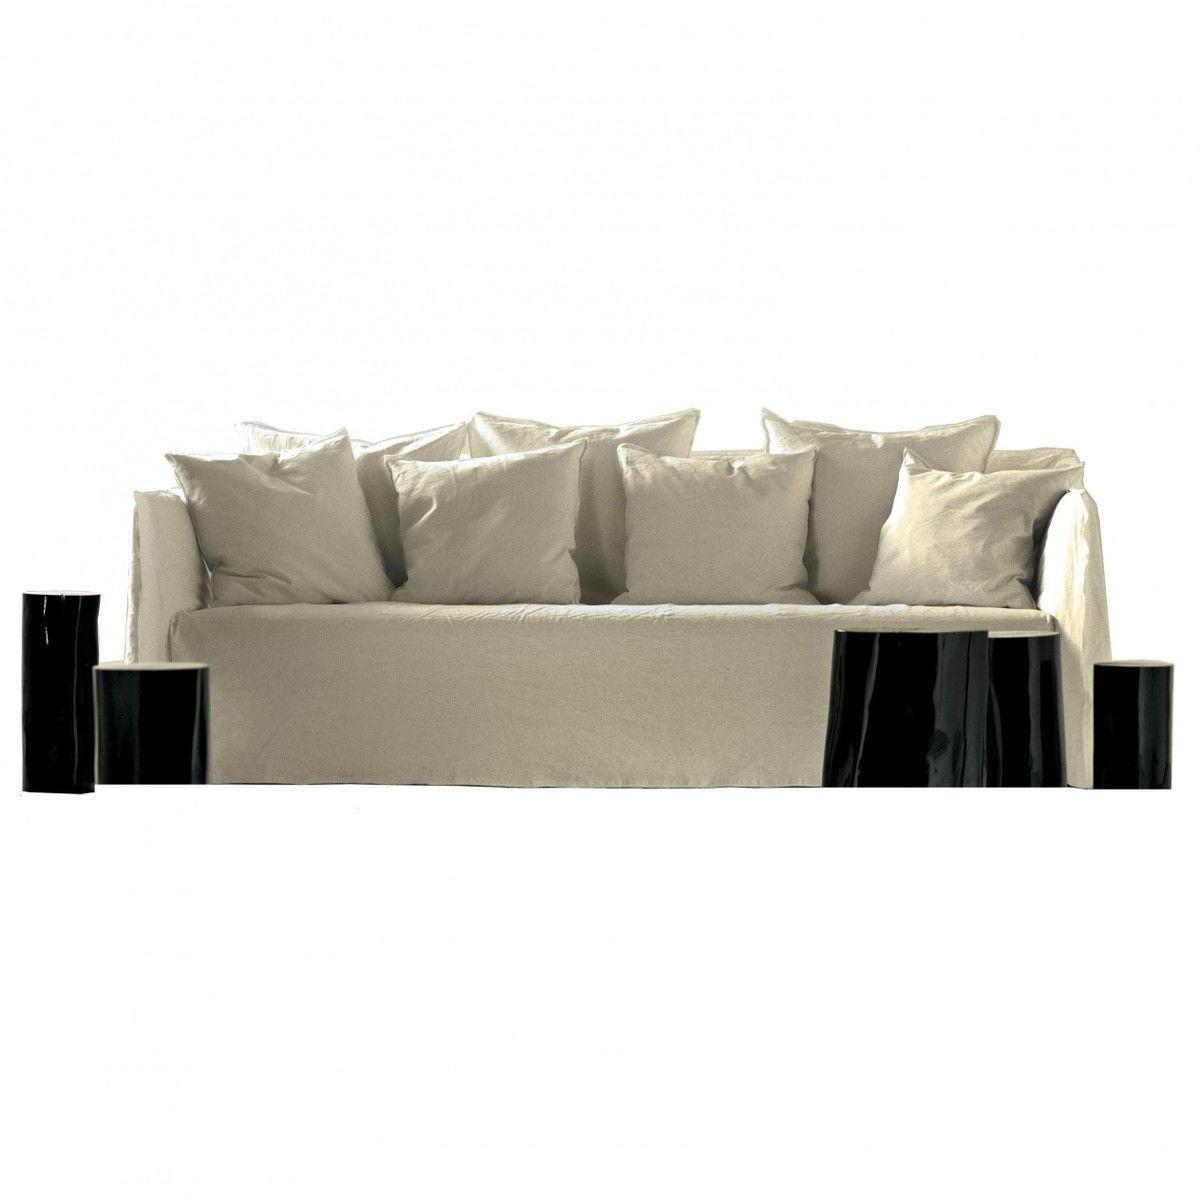 sofa cushion foam types flip open cars ghost 14 | gervasoni ambientedirect.com